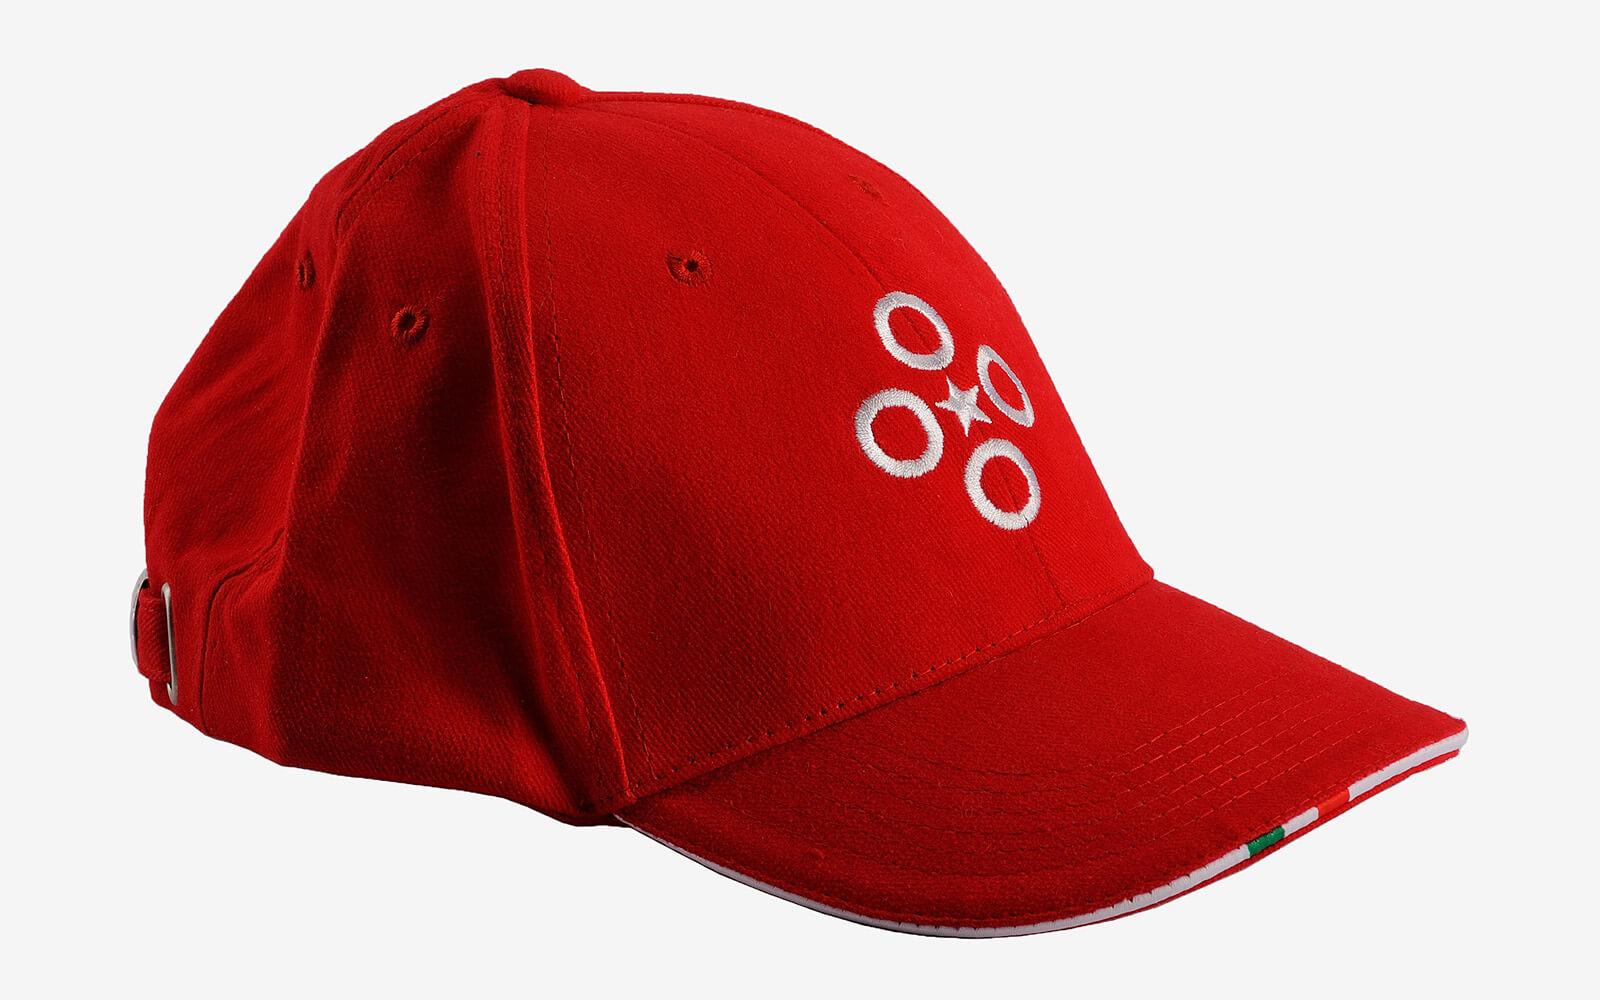 company logo emrboidered cap